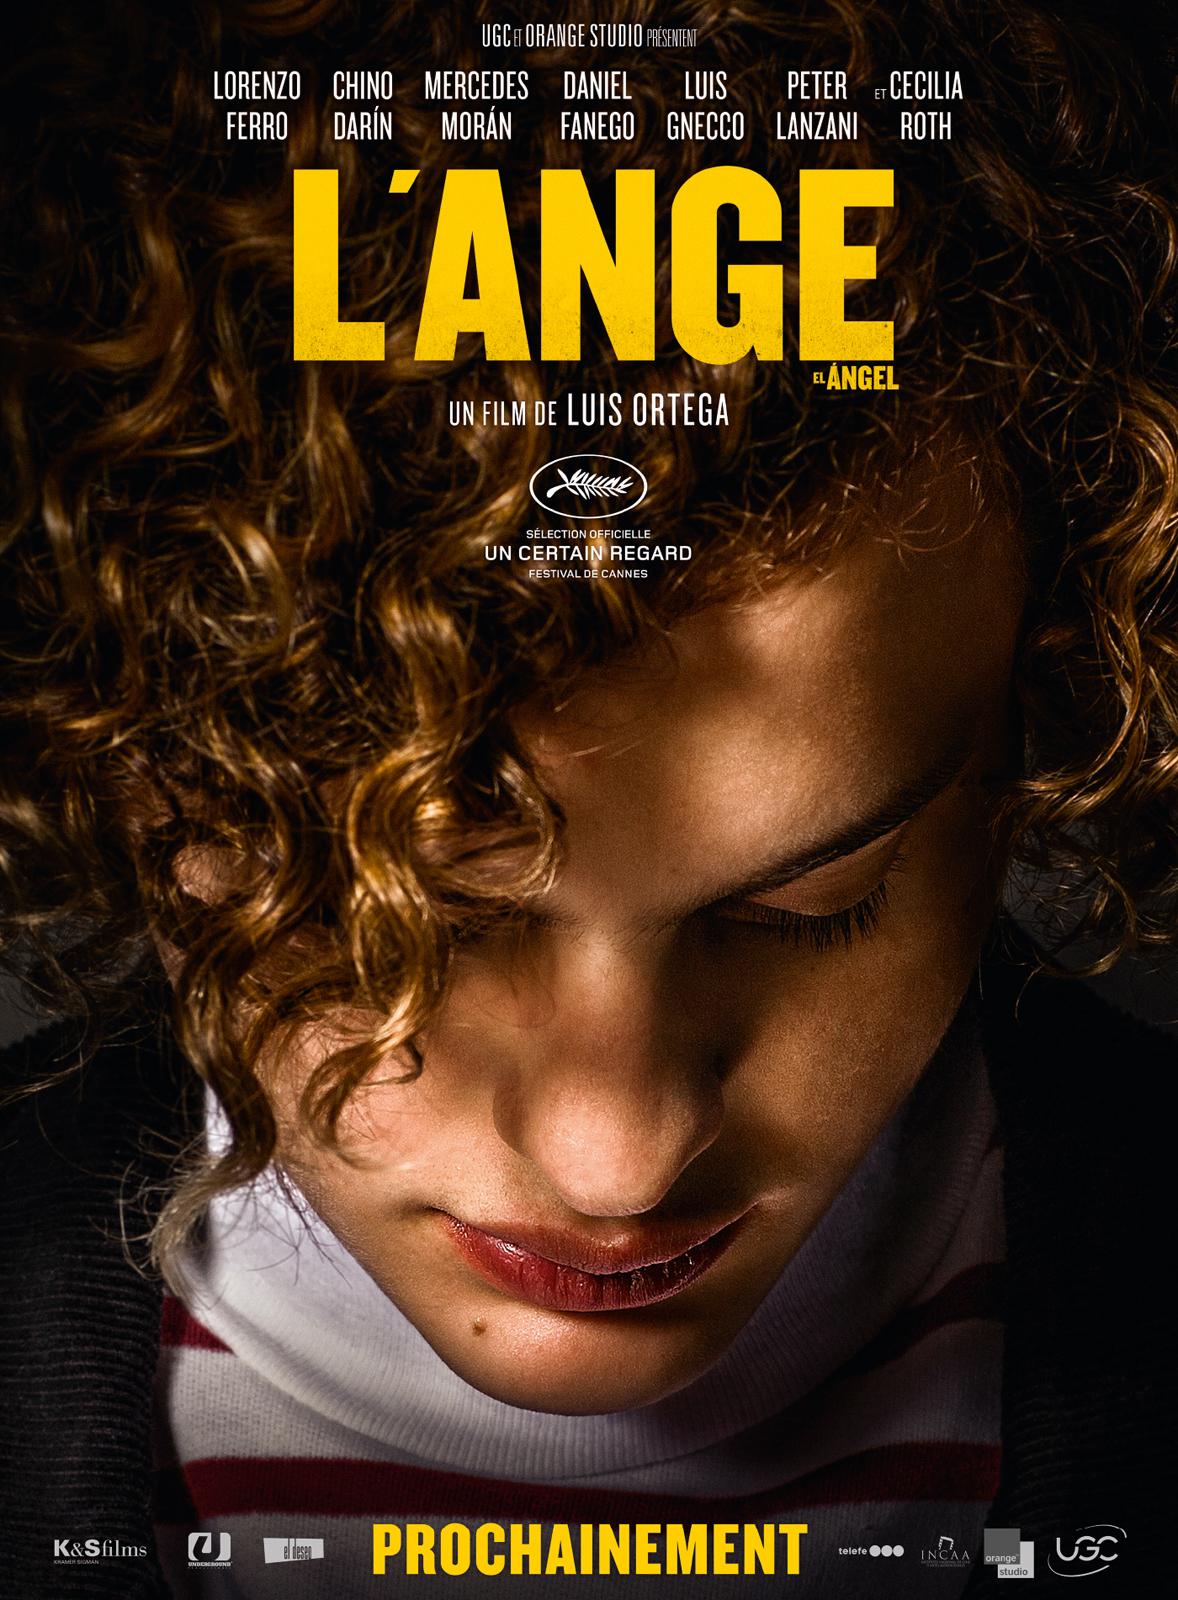 l'ange de Luis Ortega